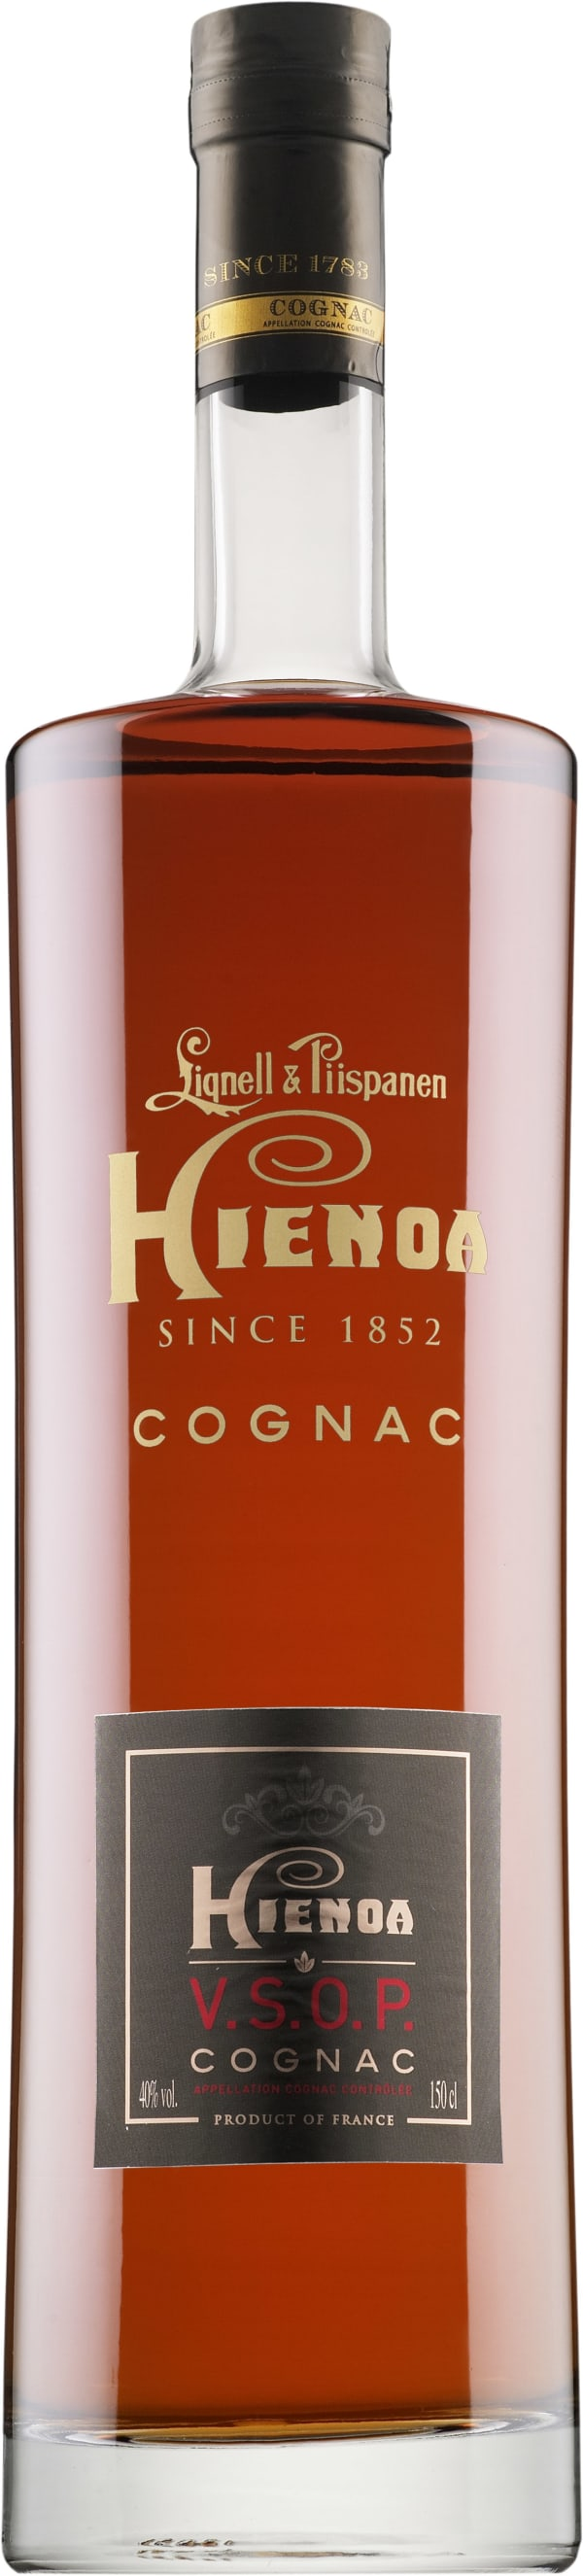 Hienoa Cognac VSOP